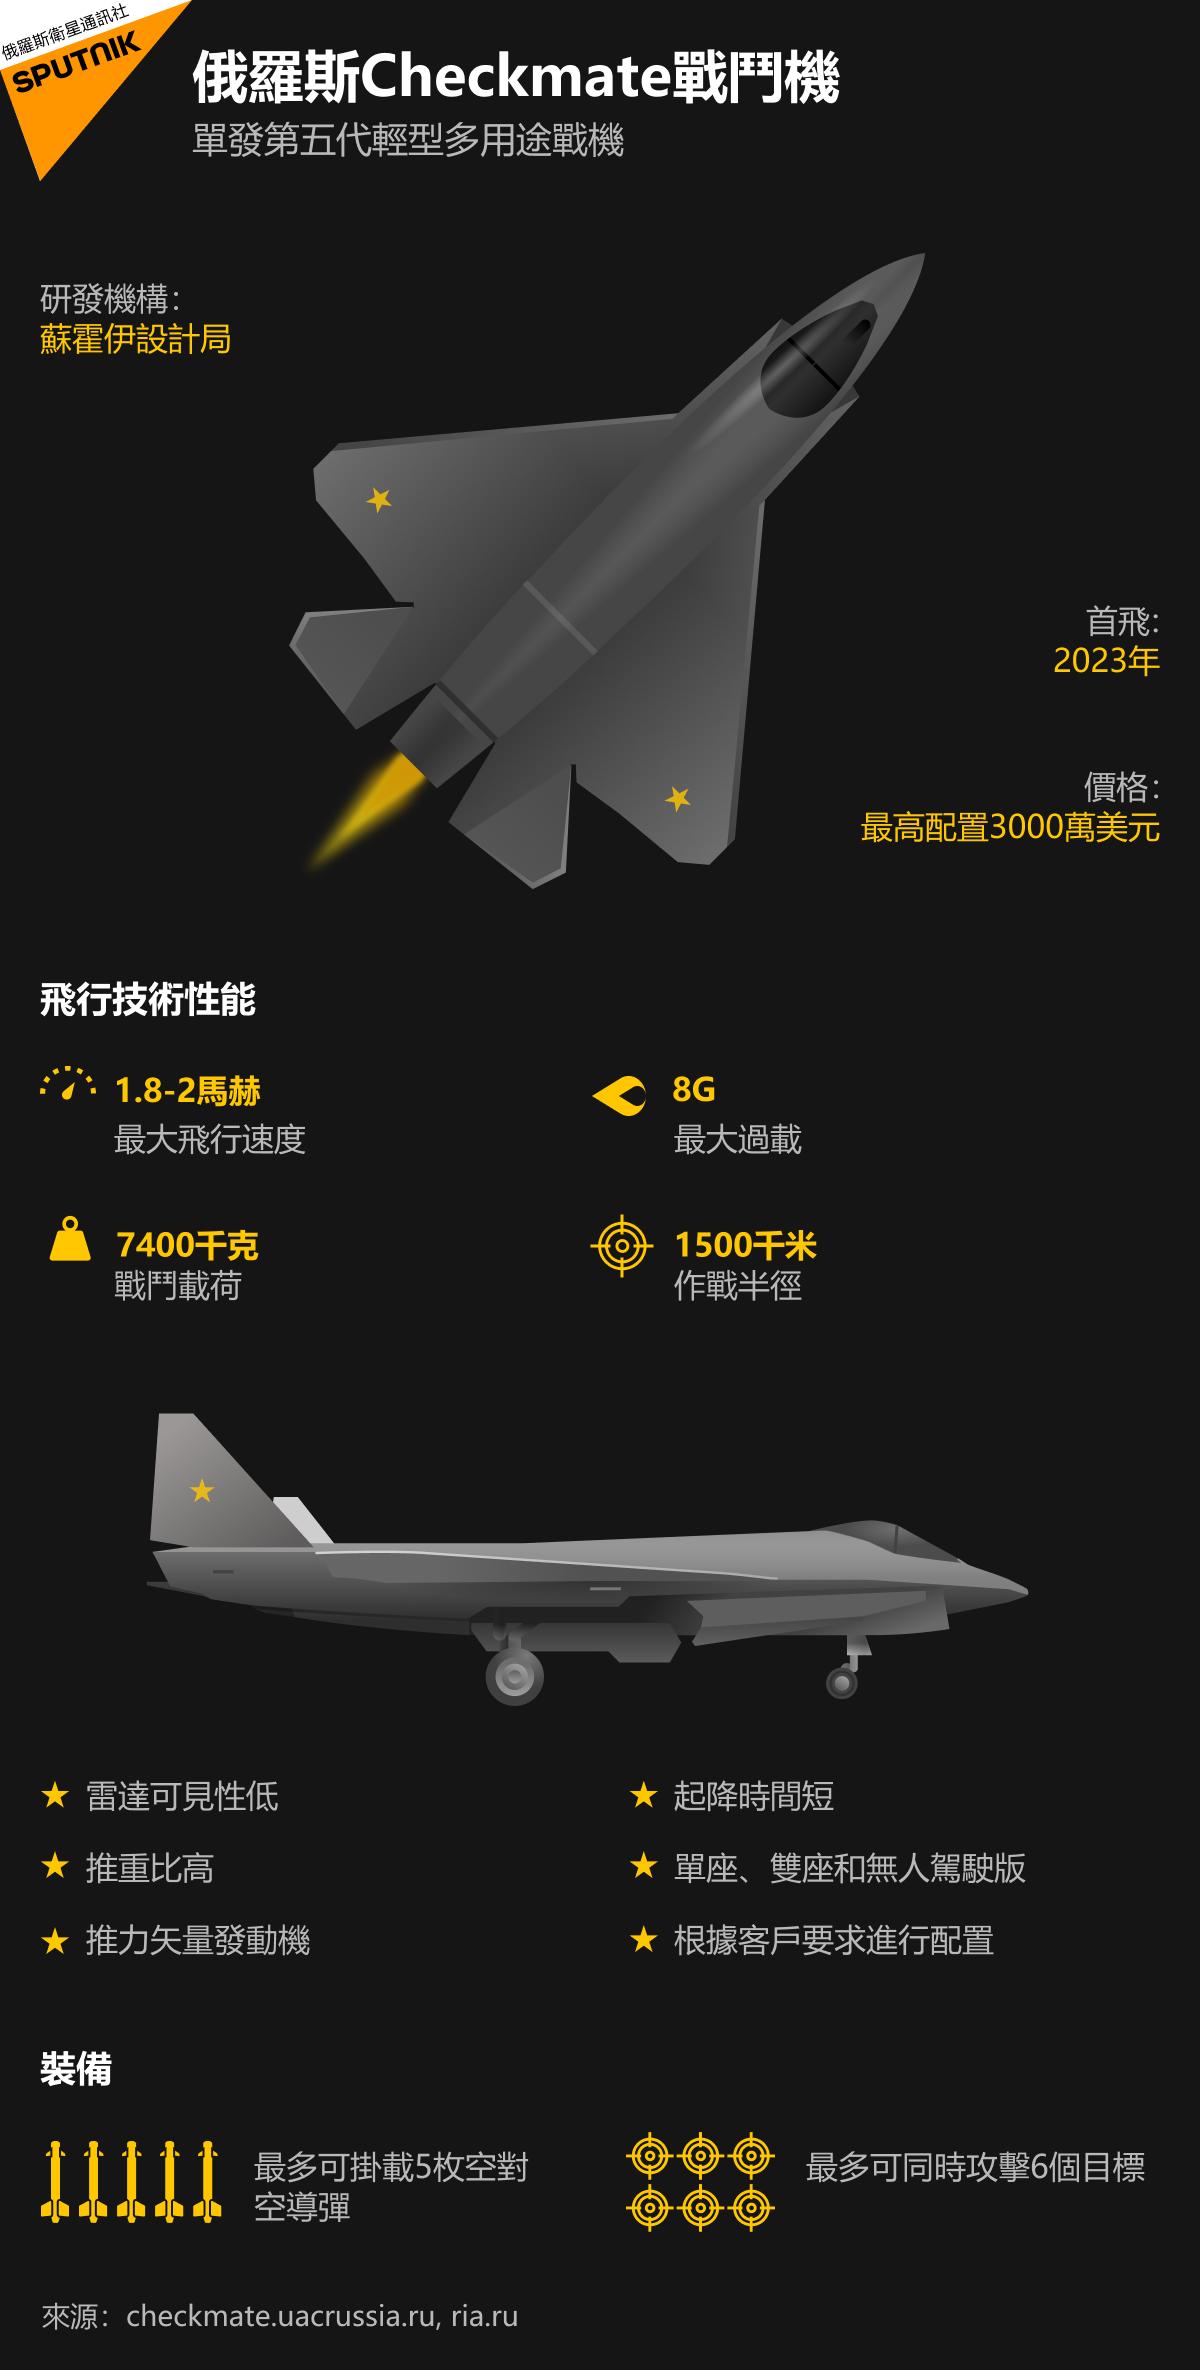 俄羅斯第五代戰鬥機「Checkmate」